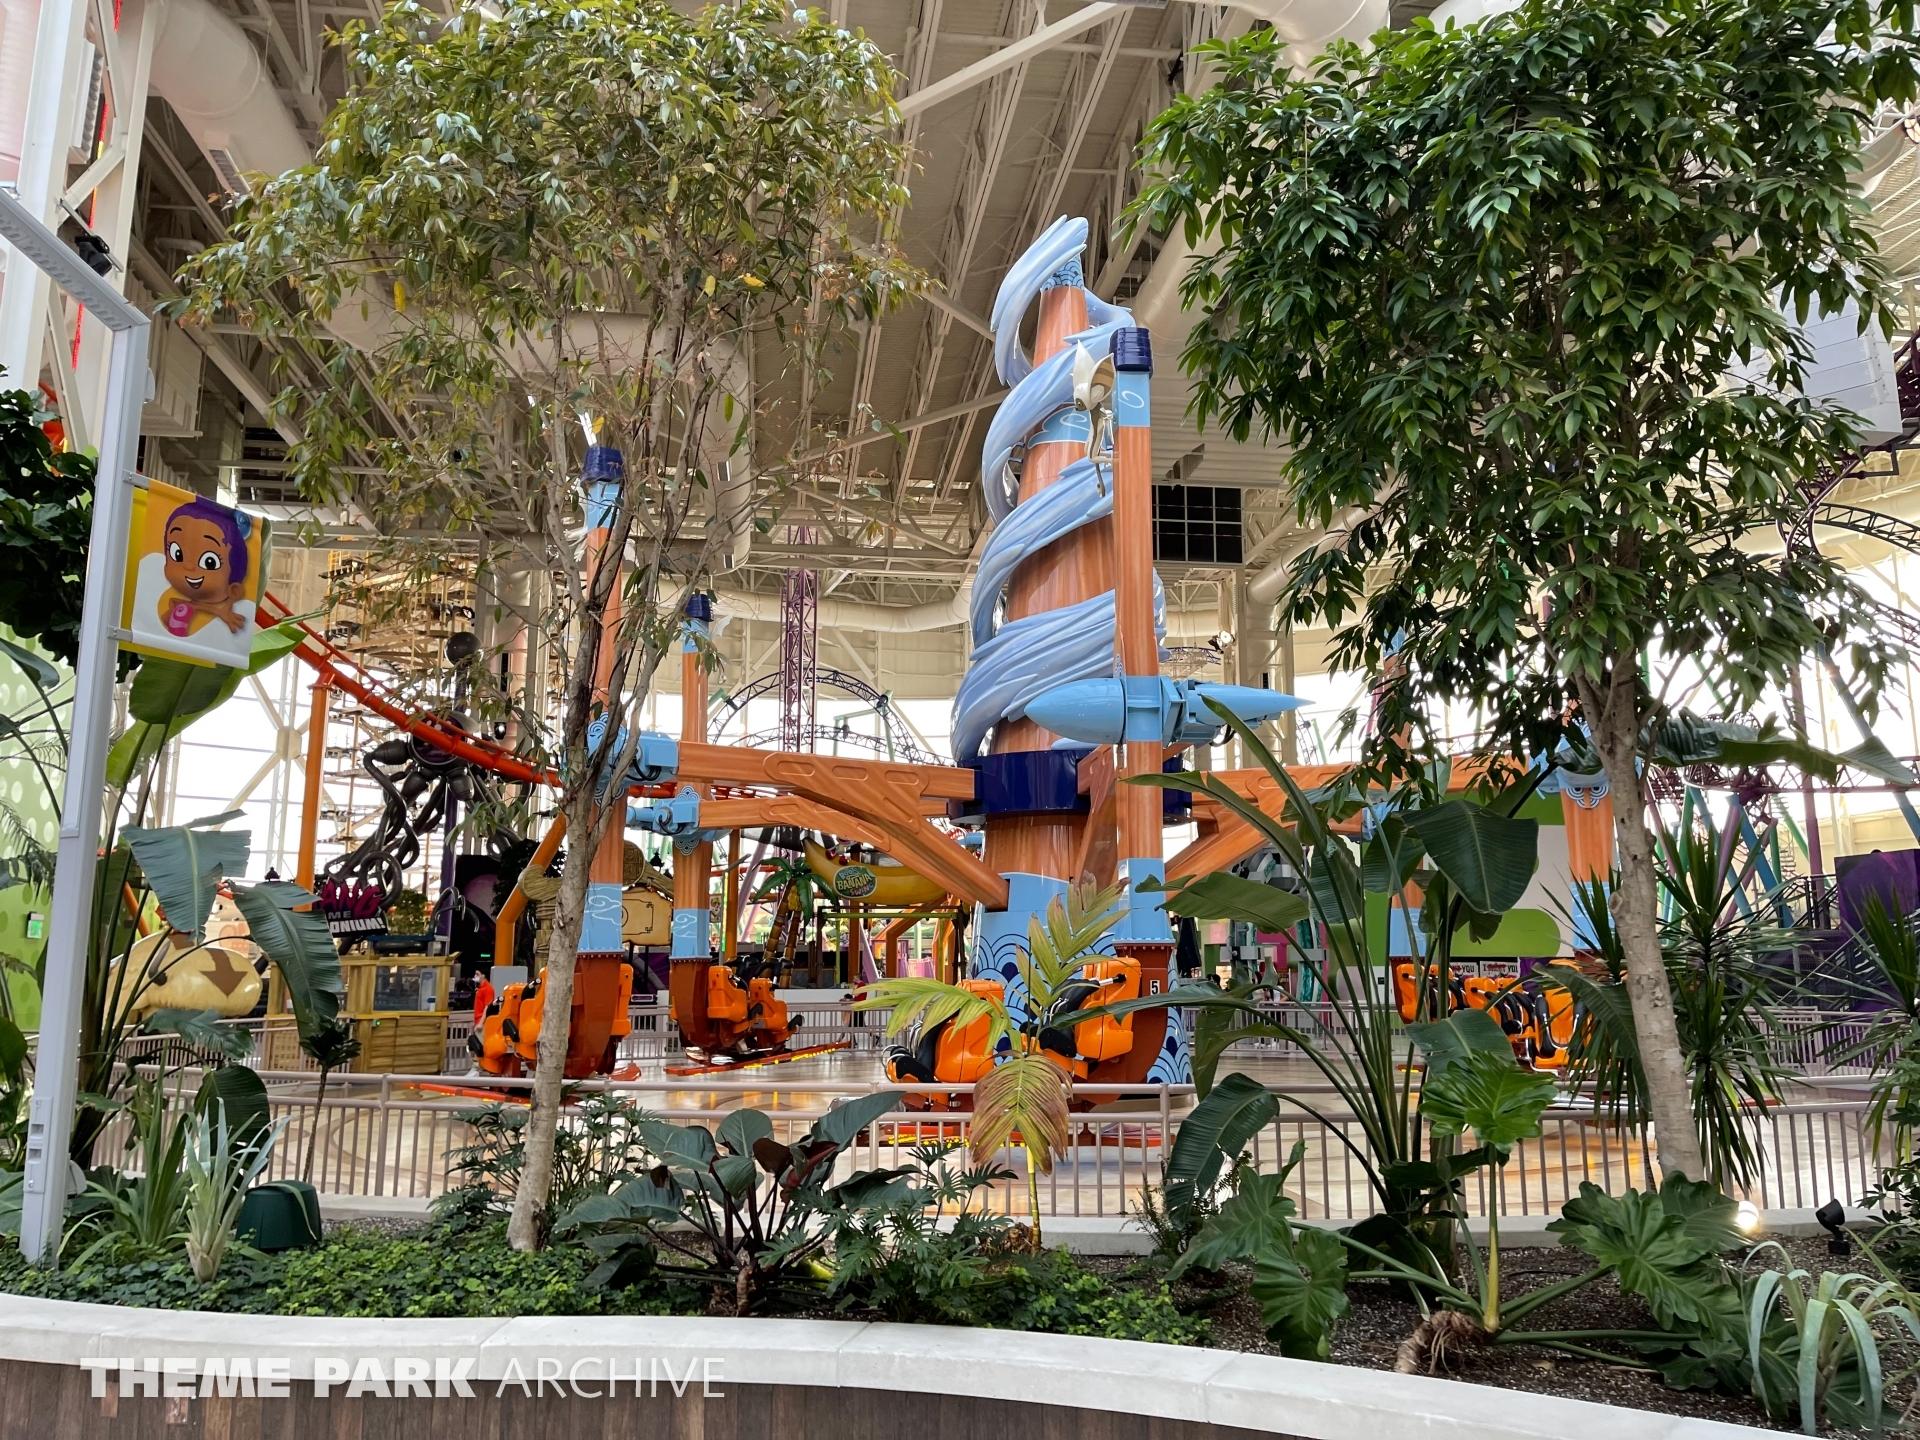 Aang's Air Gliders at Nickelodeon Universe at American Dream